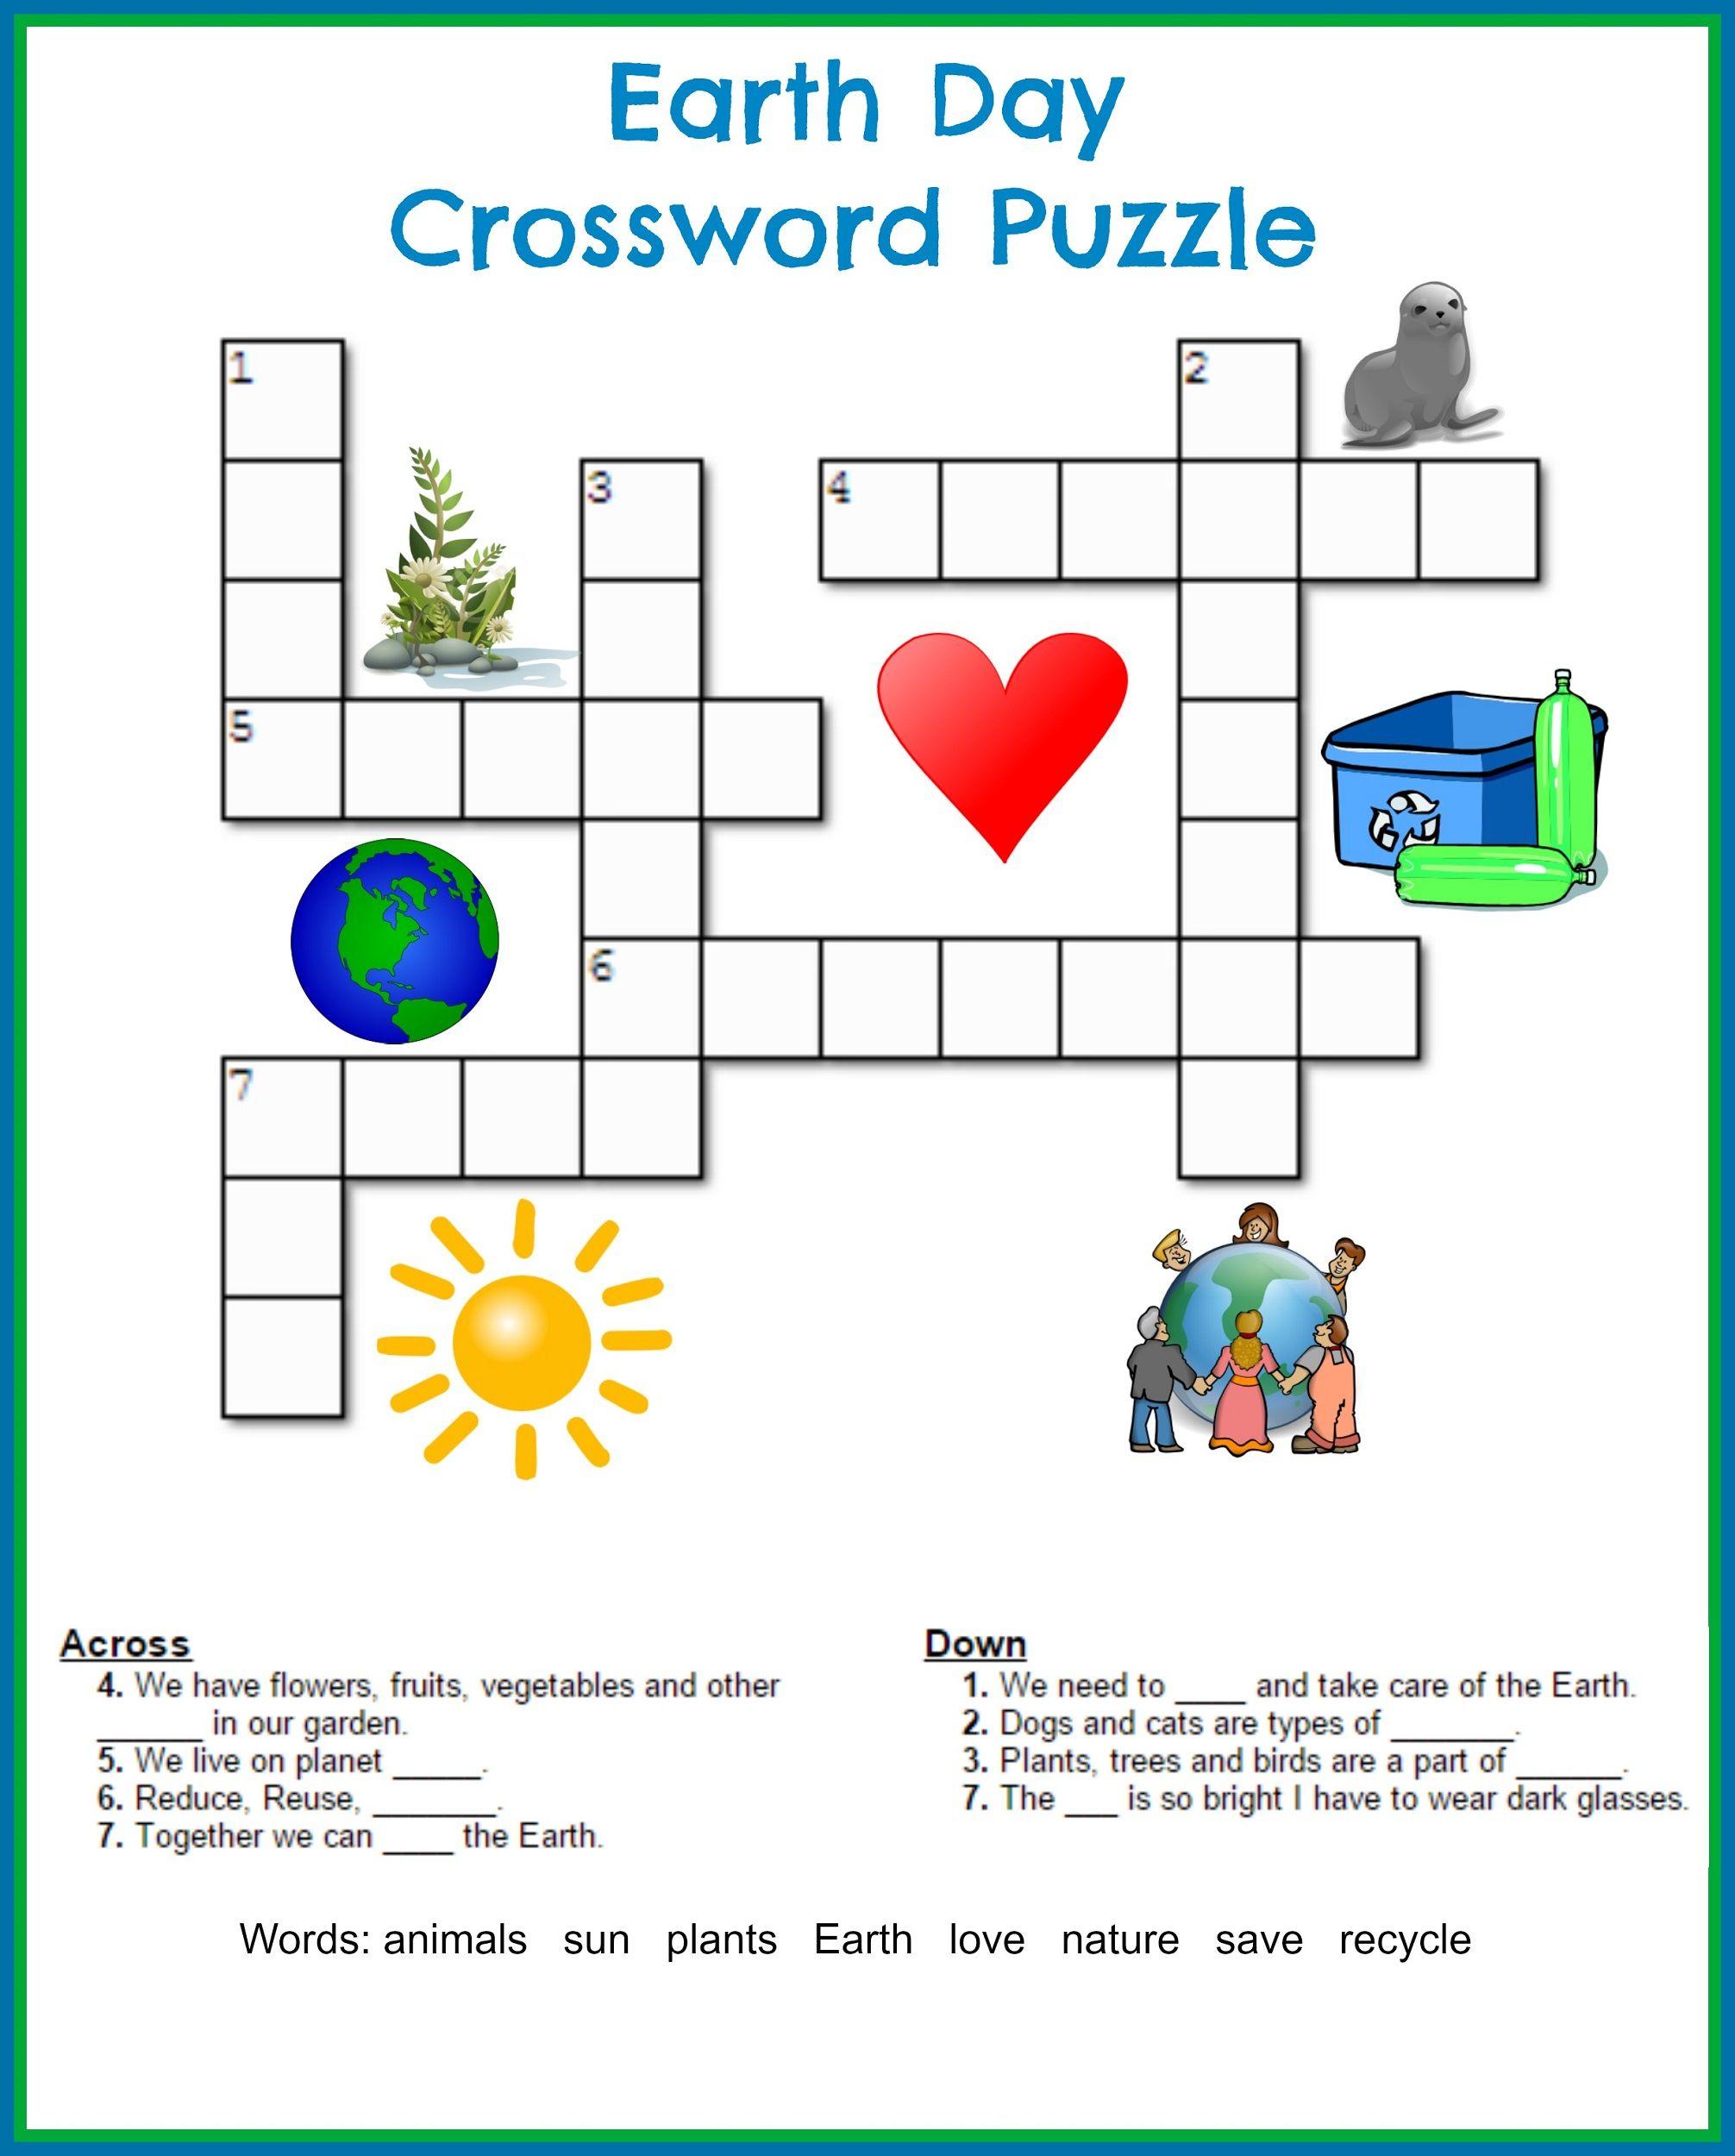 Printable Crossword Puzzles Kids | Crossword Puzzles On Earth - Printable Crosswords For Year 4